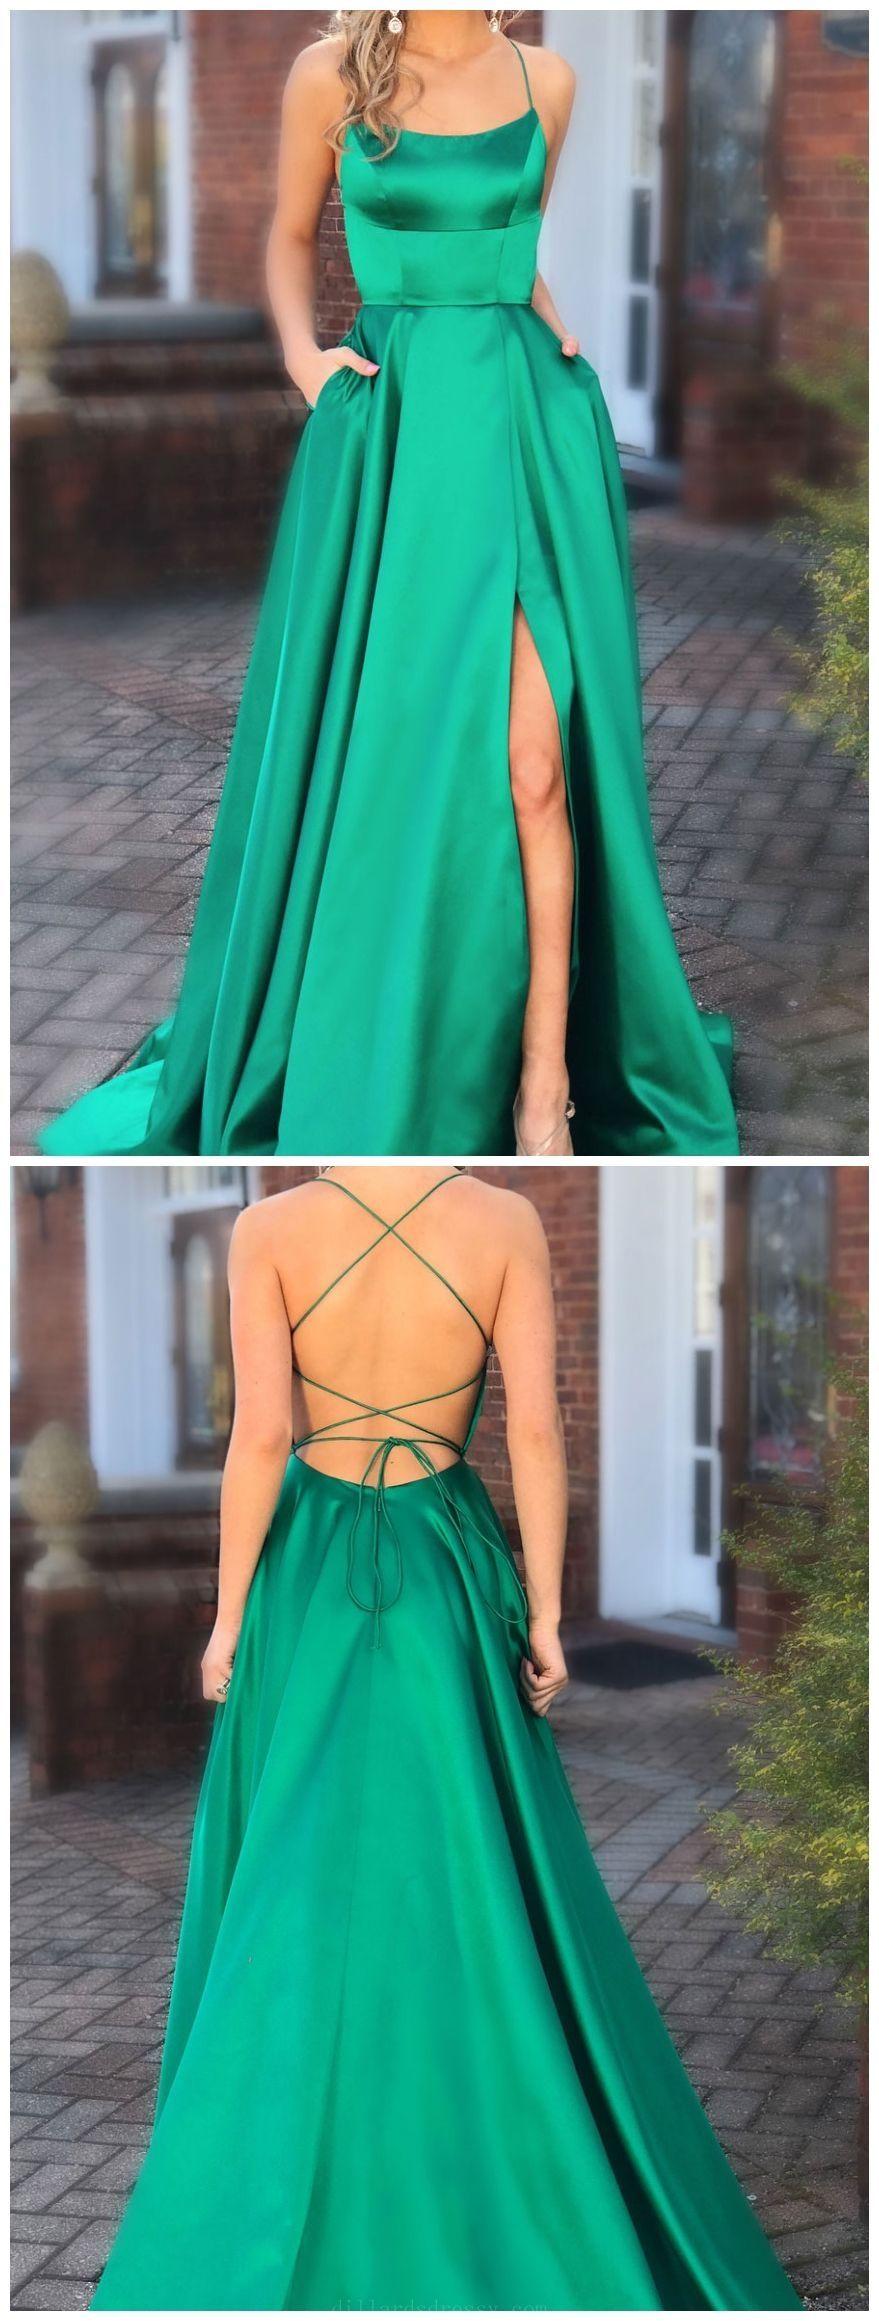 Splendid backless prom dresses prom dresses prom dresses long